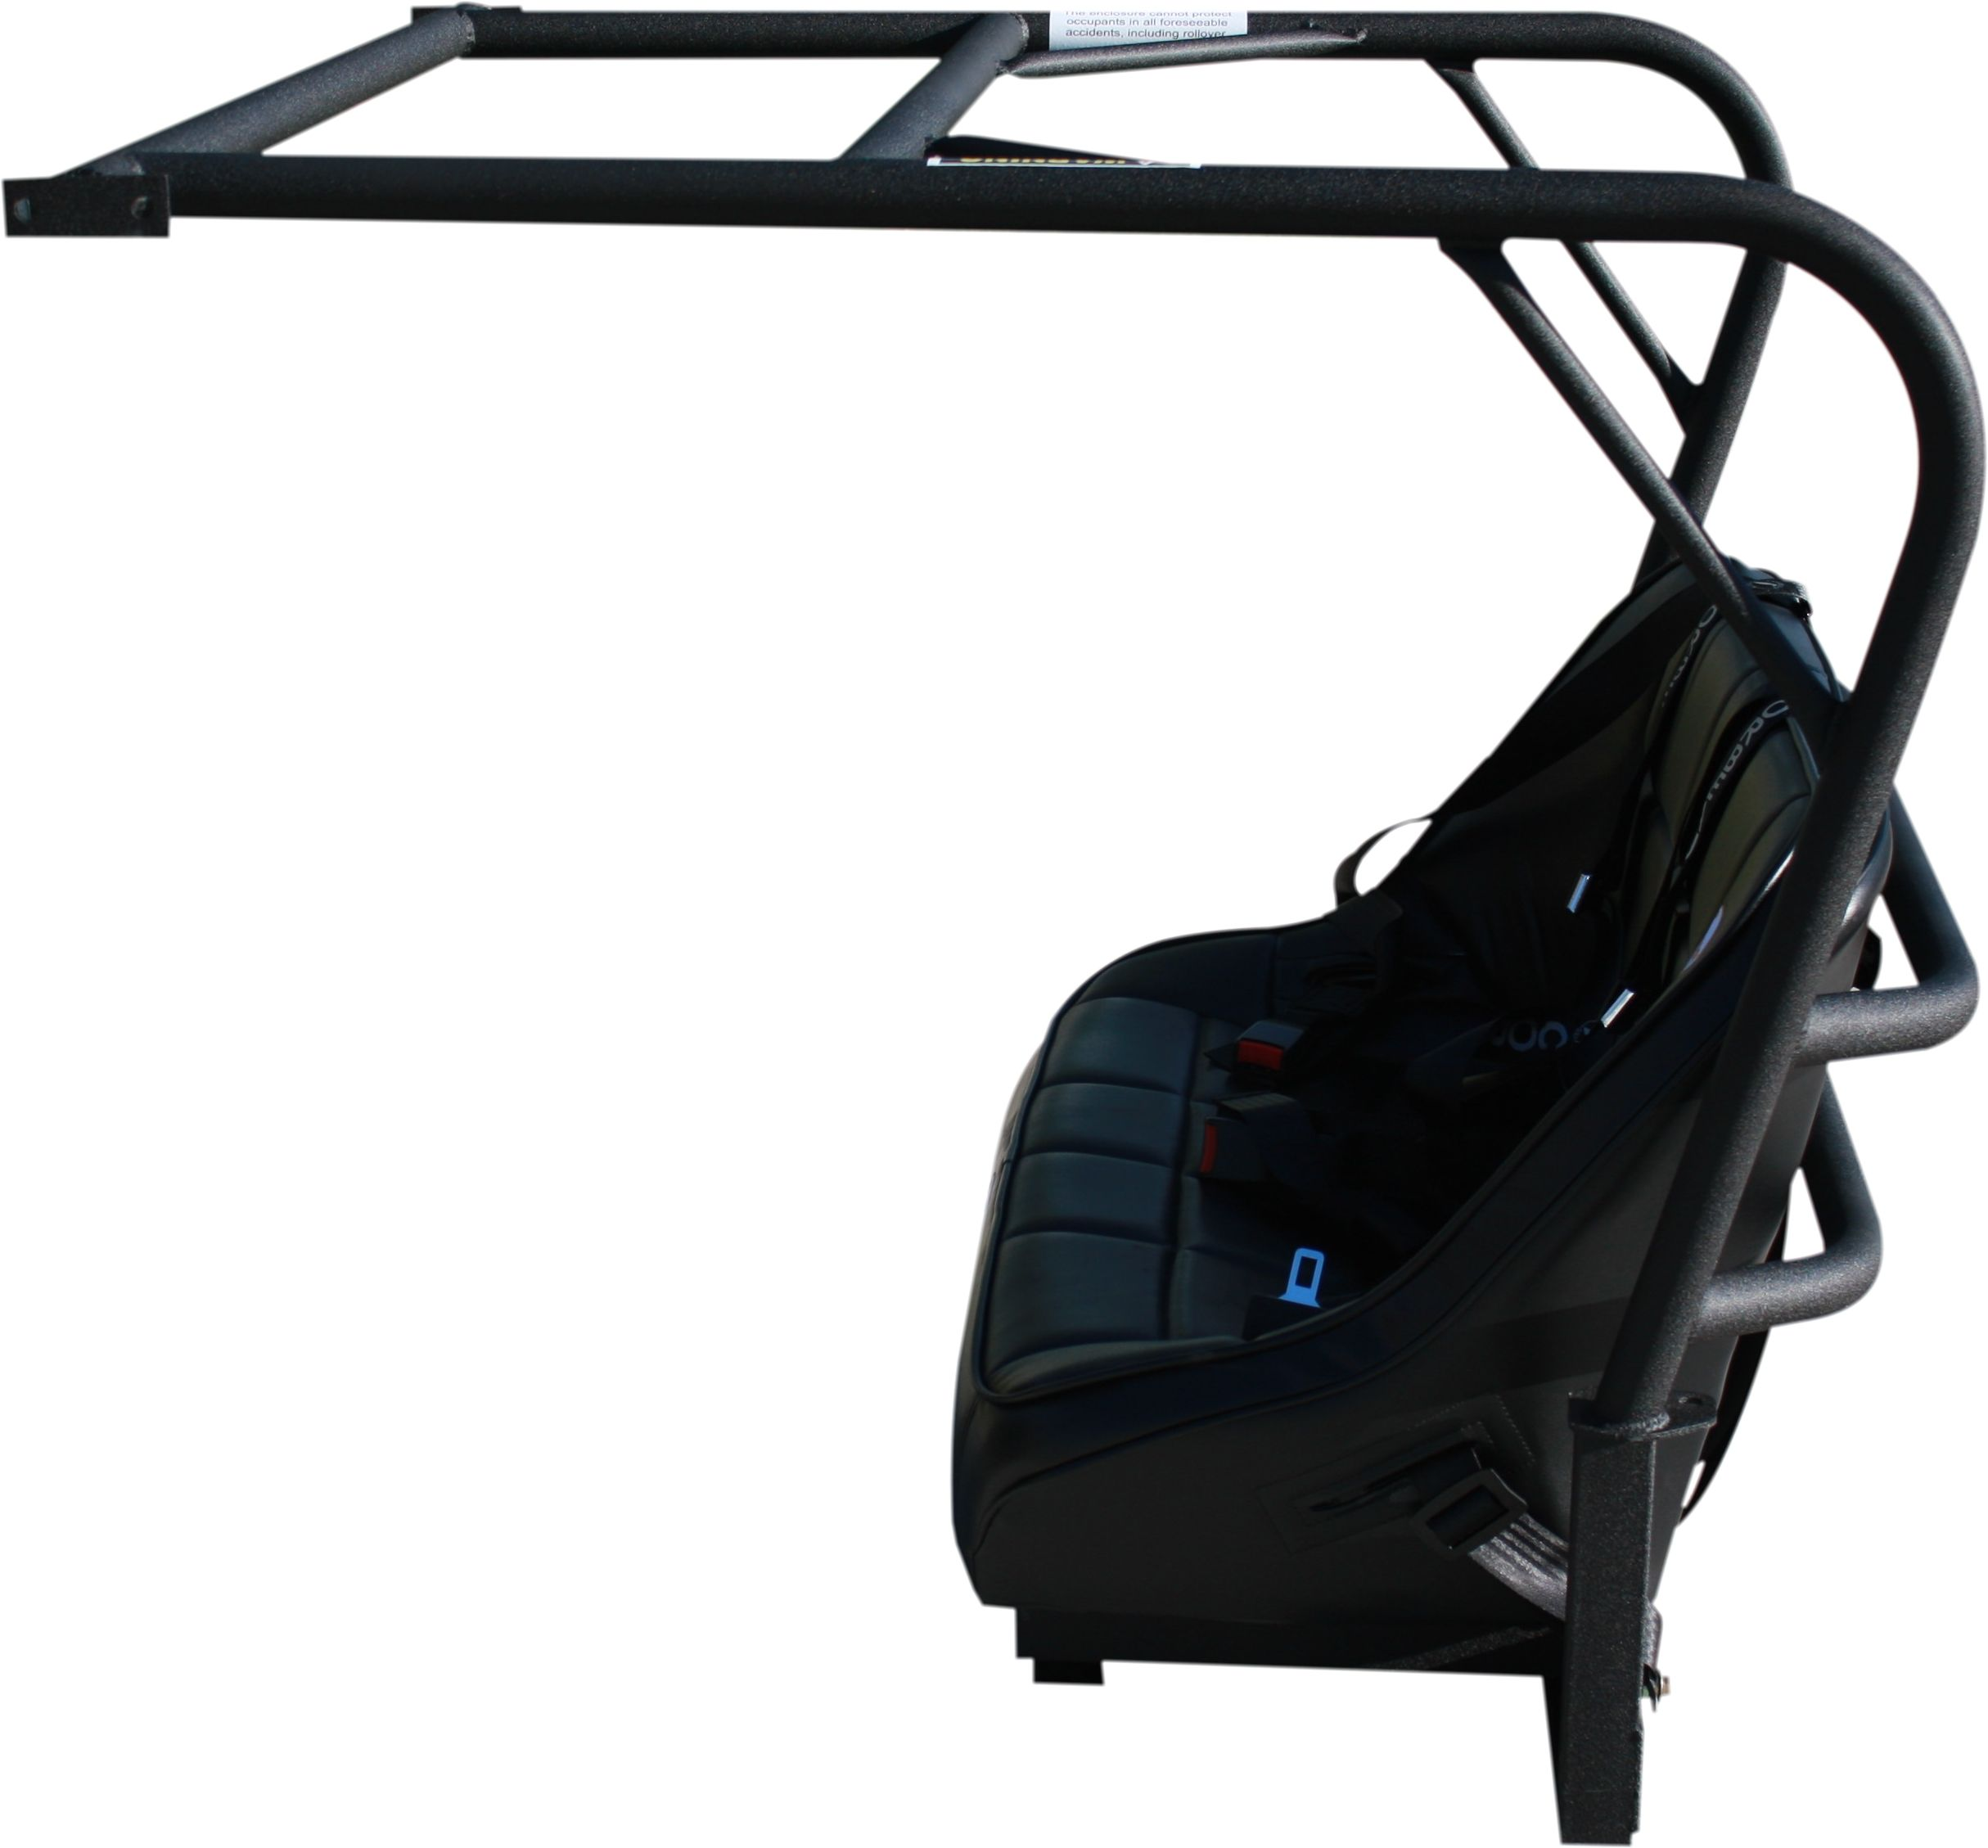 Kawasaki Side By Side Bench Seats